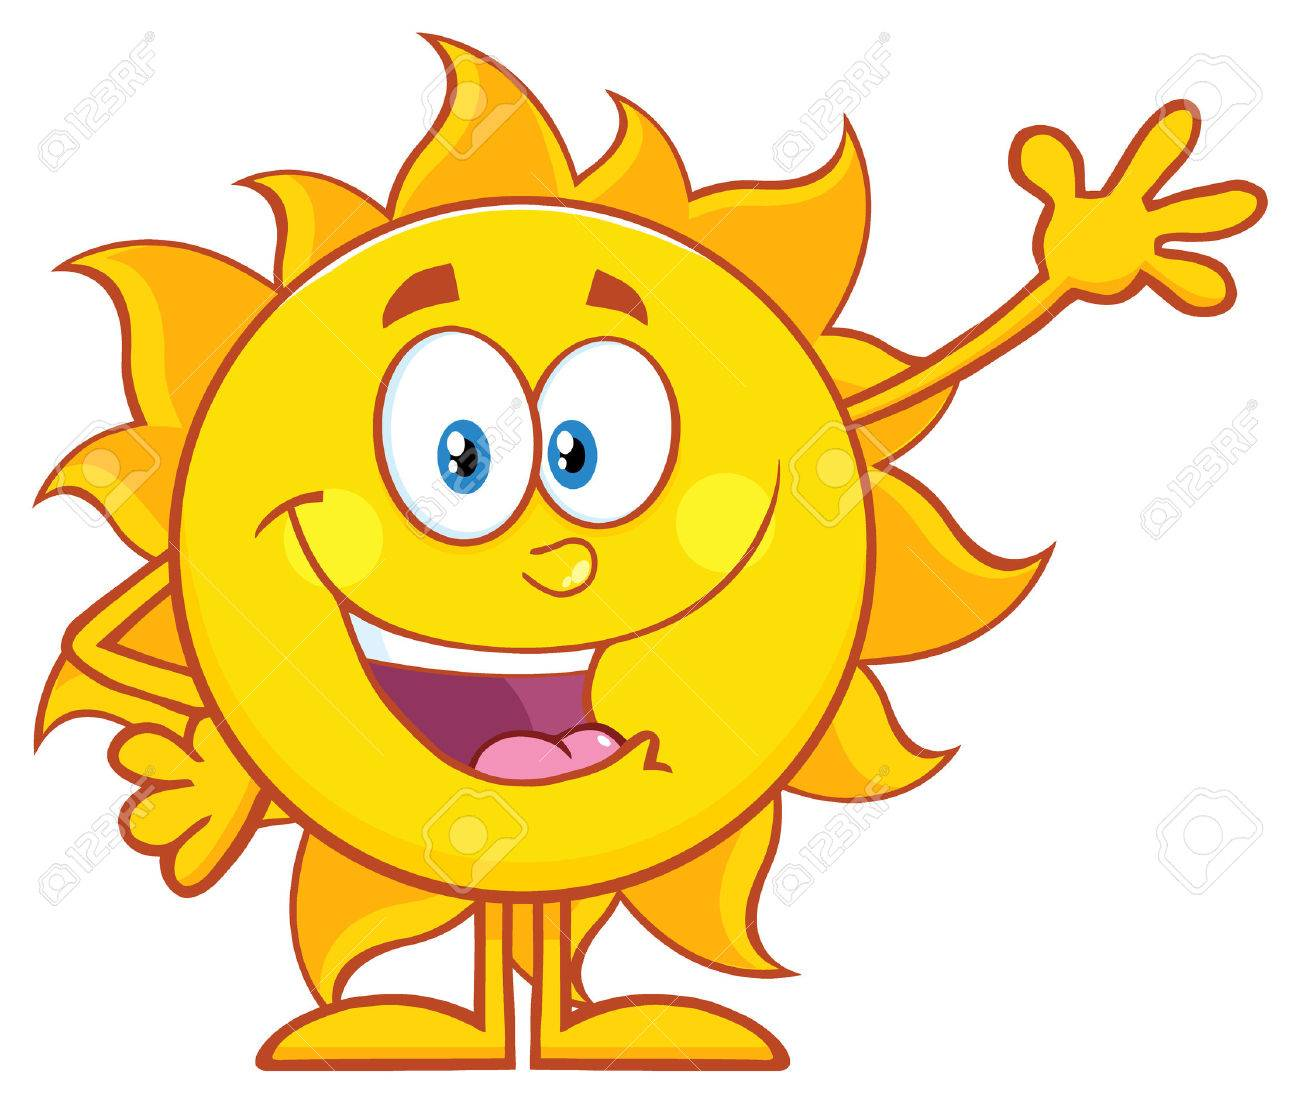 happy sun cartoon mascot character waving for greeting stock photo rh 123rf com cartoon sun images download sun cartoon pic